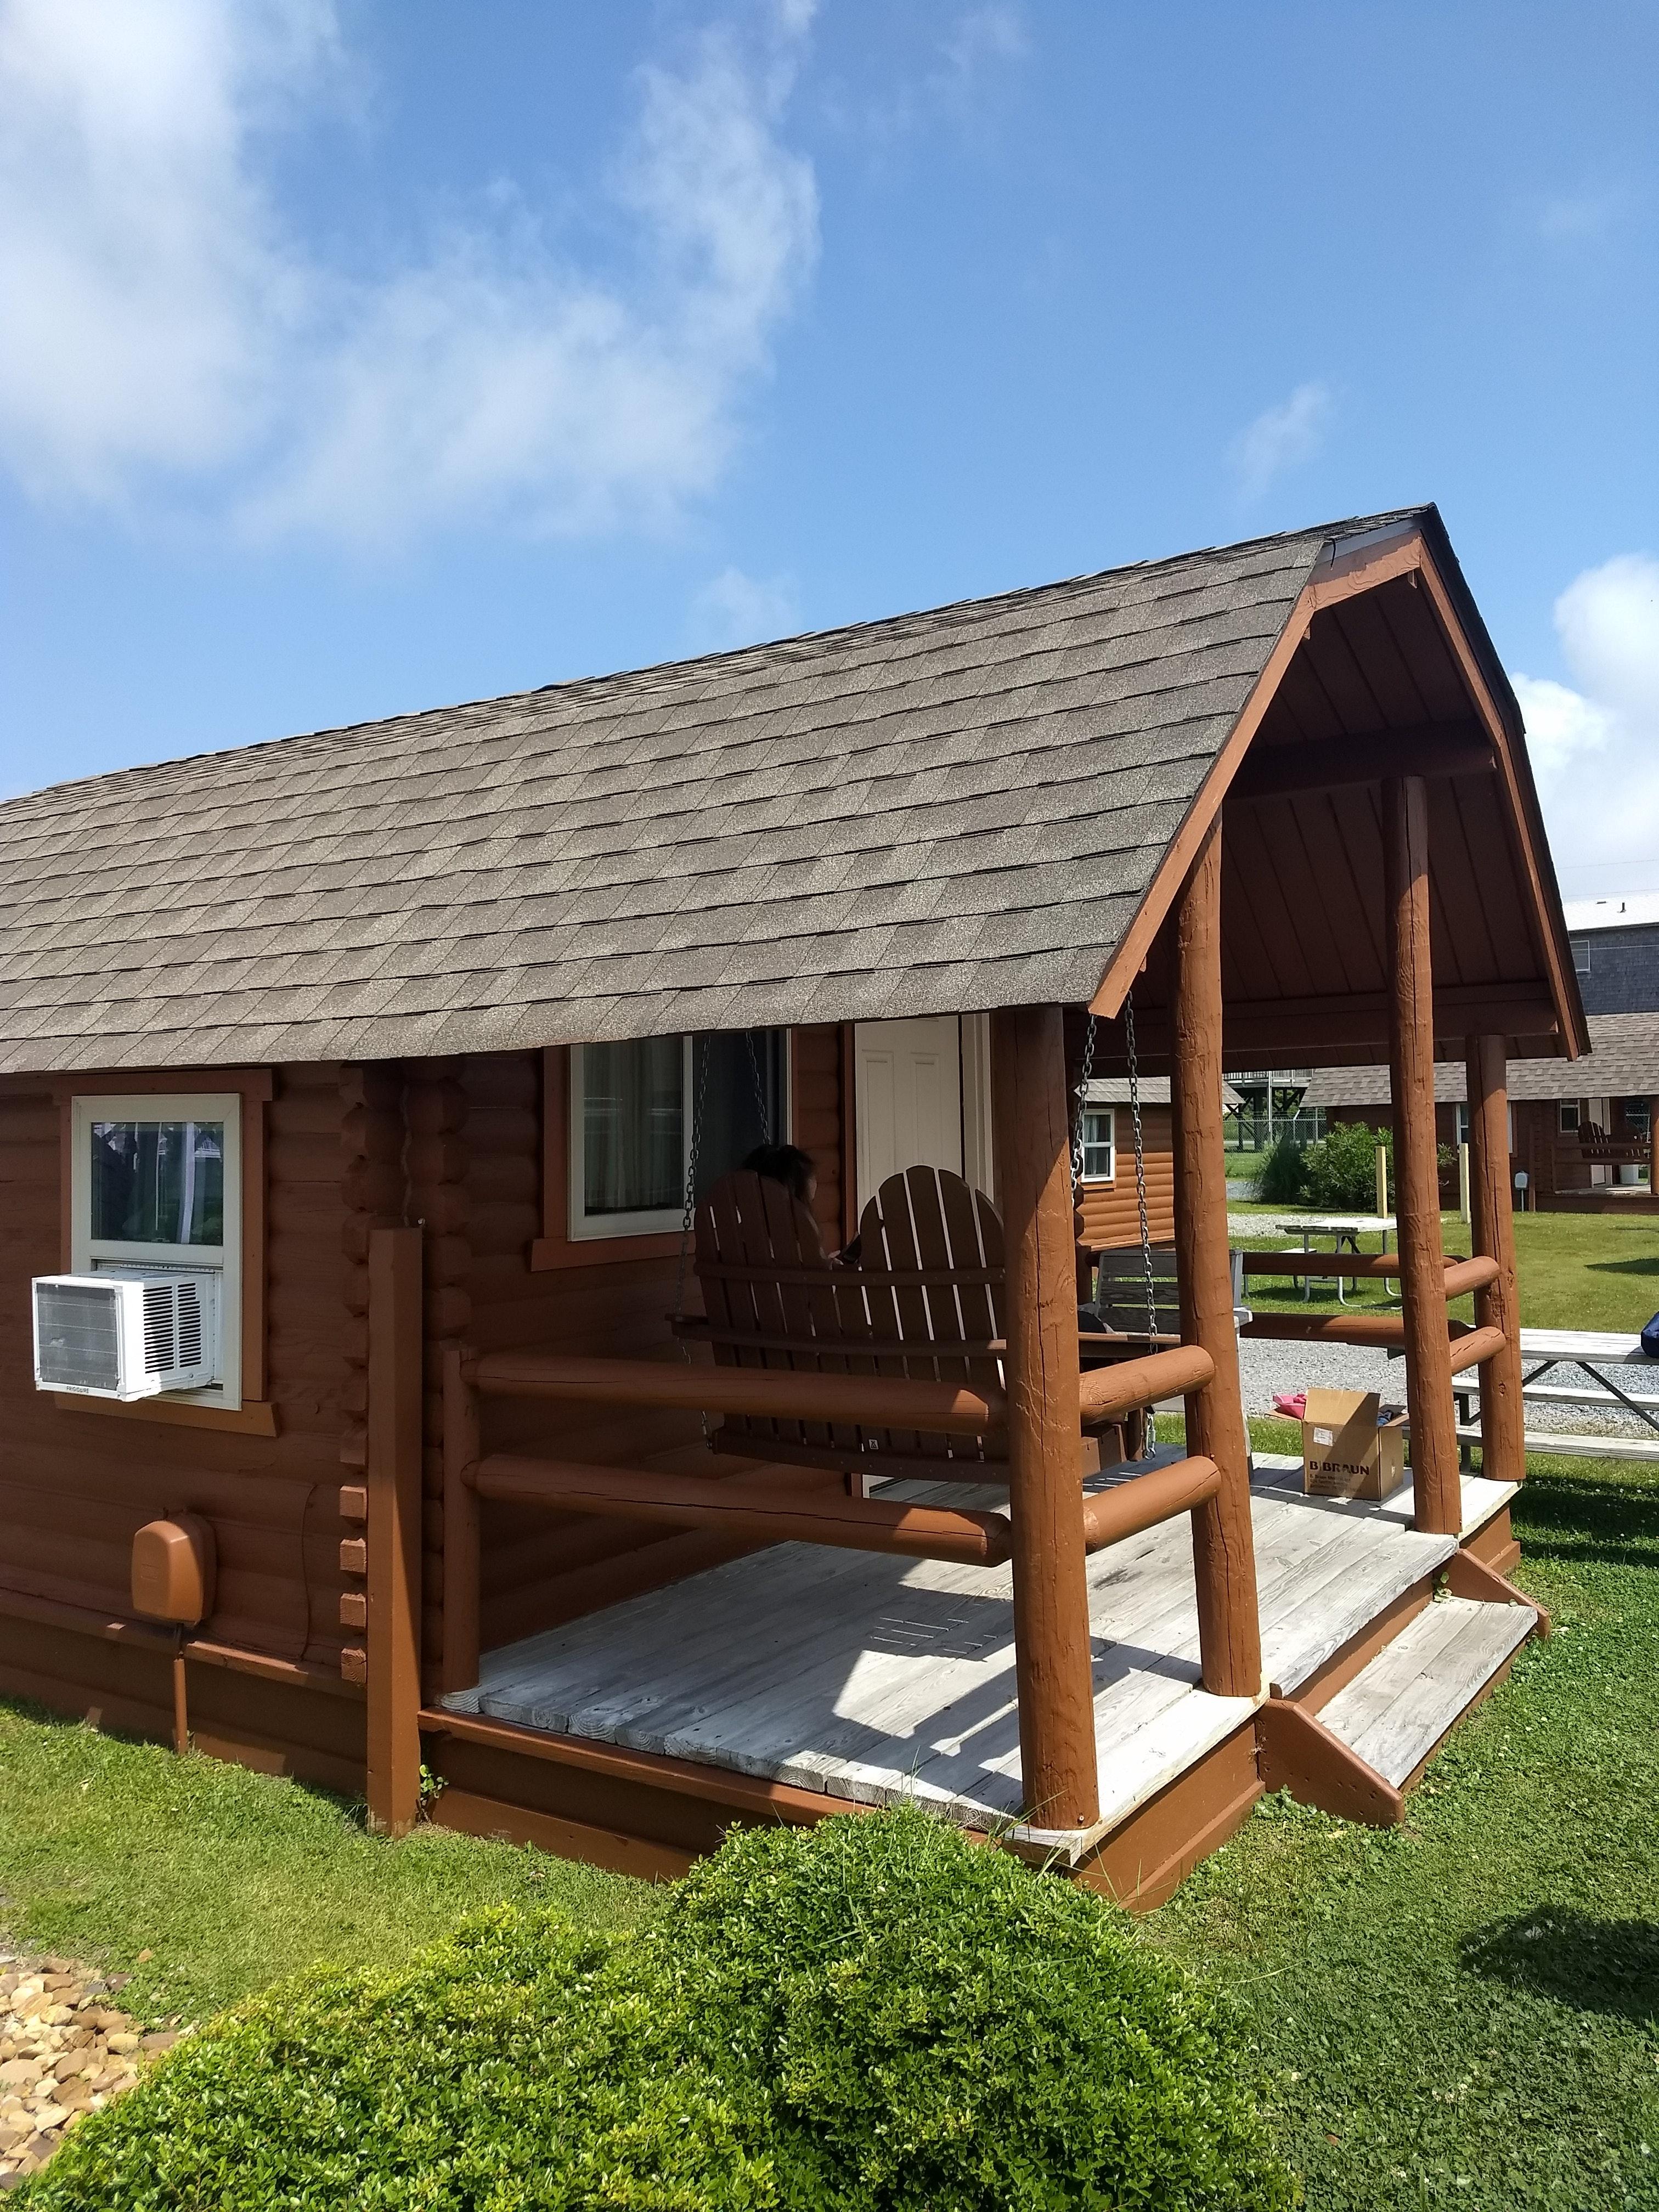 Free stock photo of cabin, log cabin, Vacation cabin